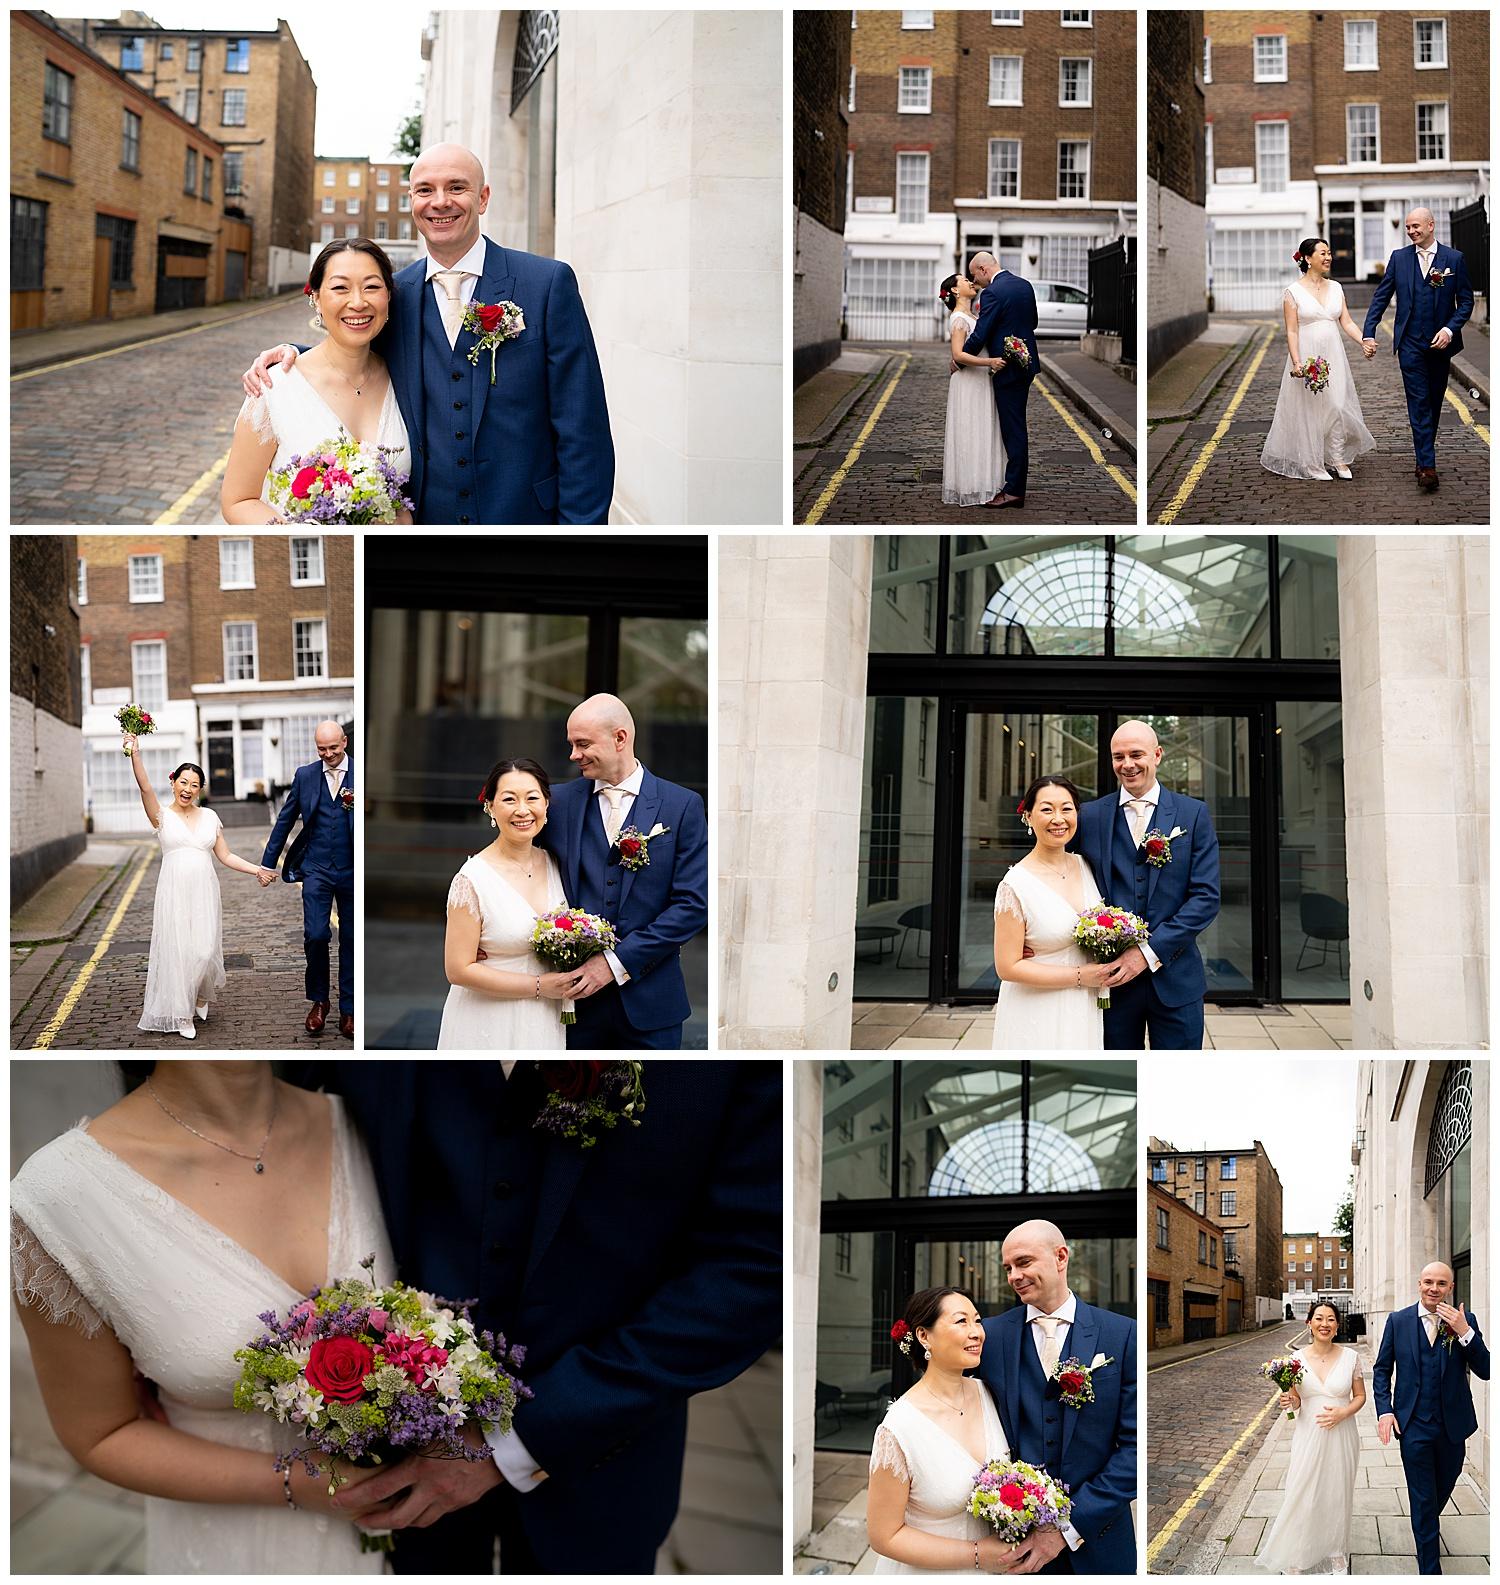 marylebone-town-hall-wedding-8.jpg